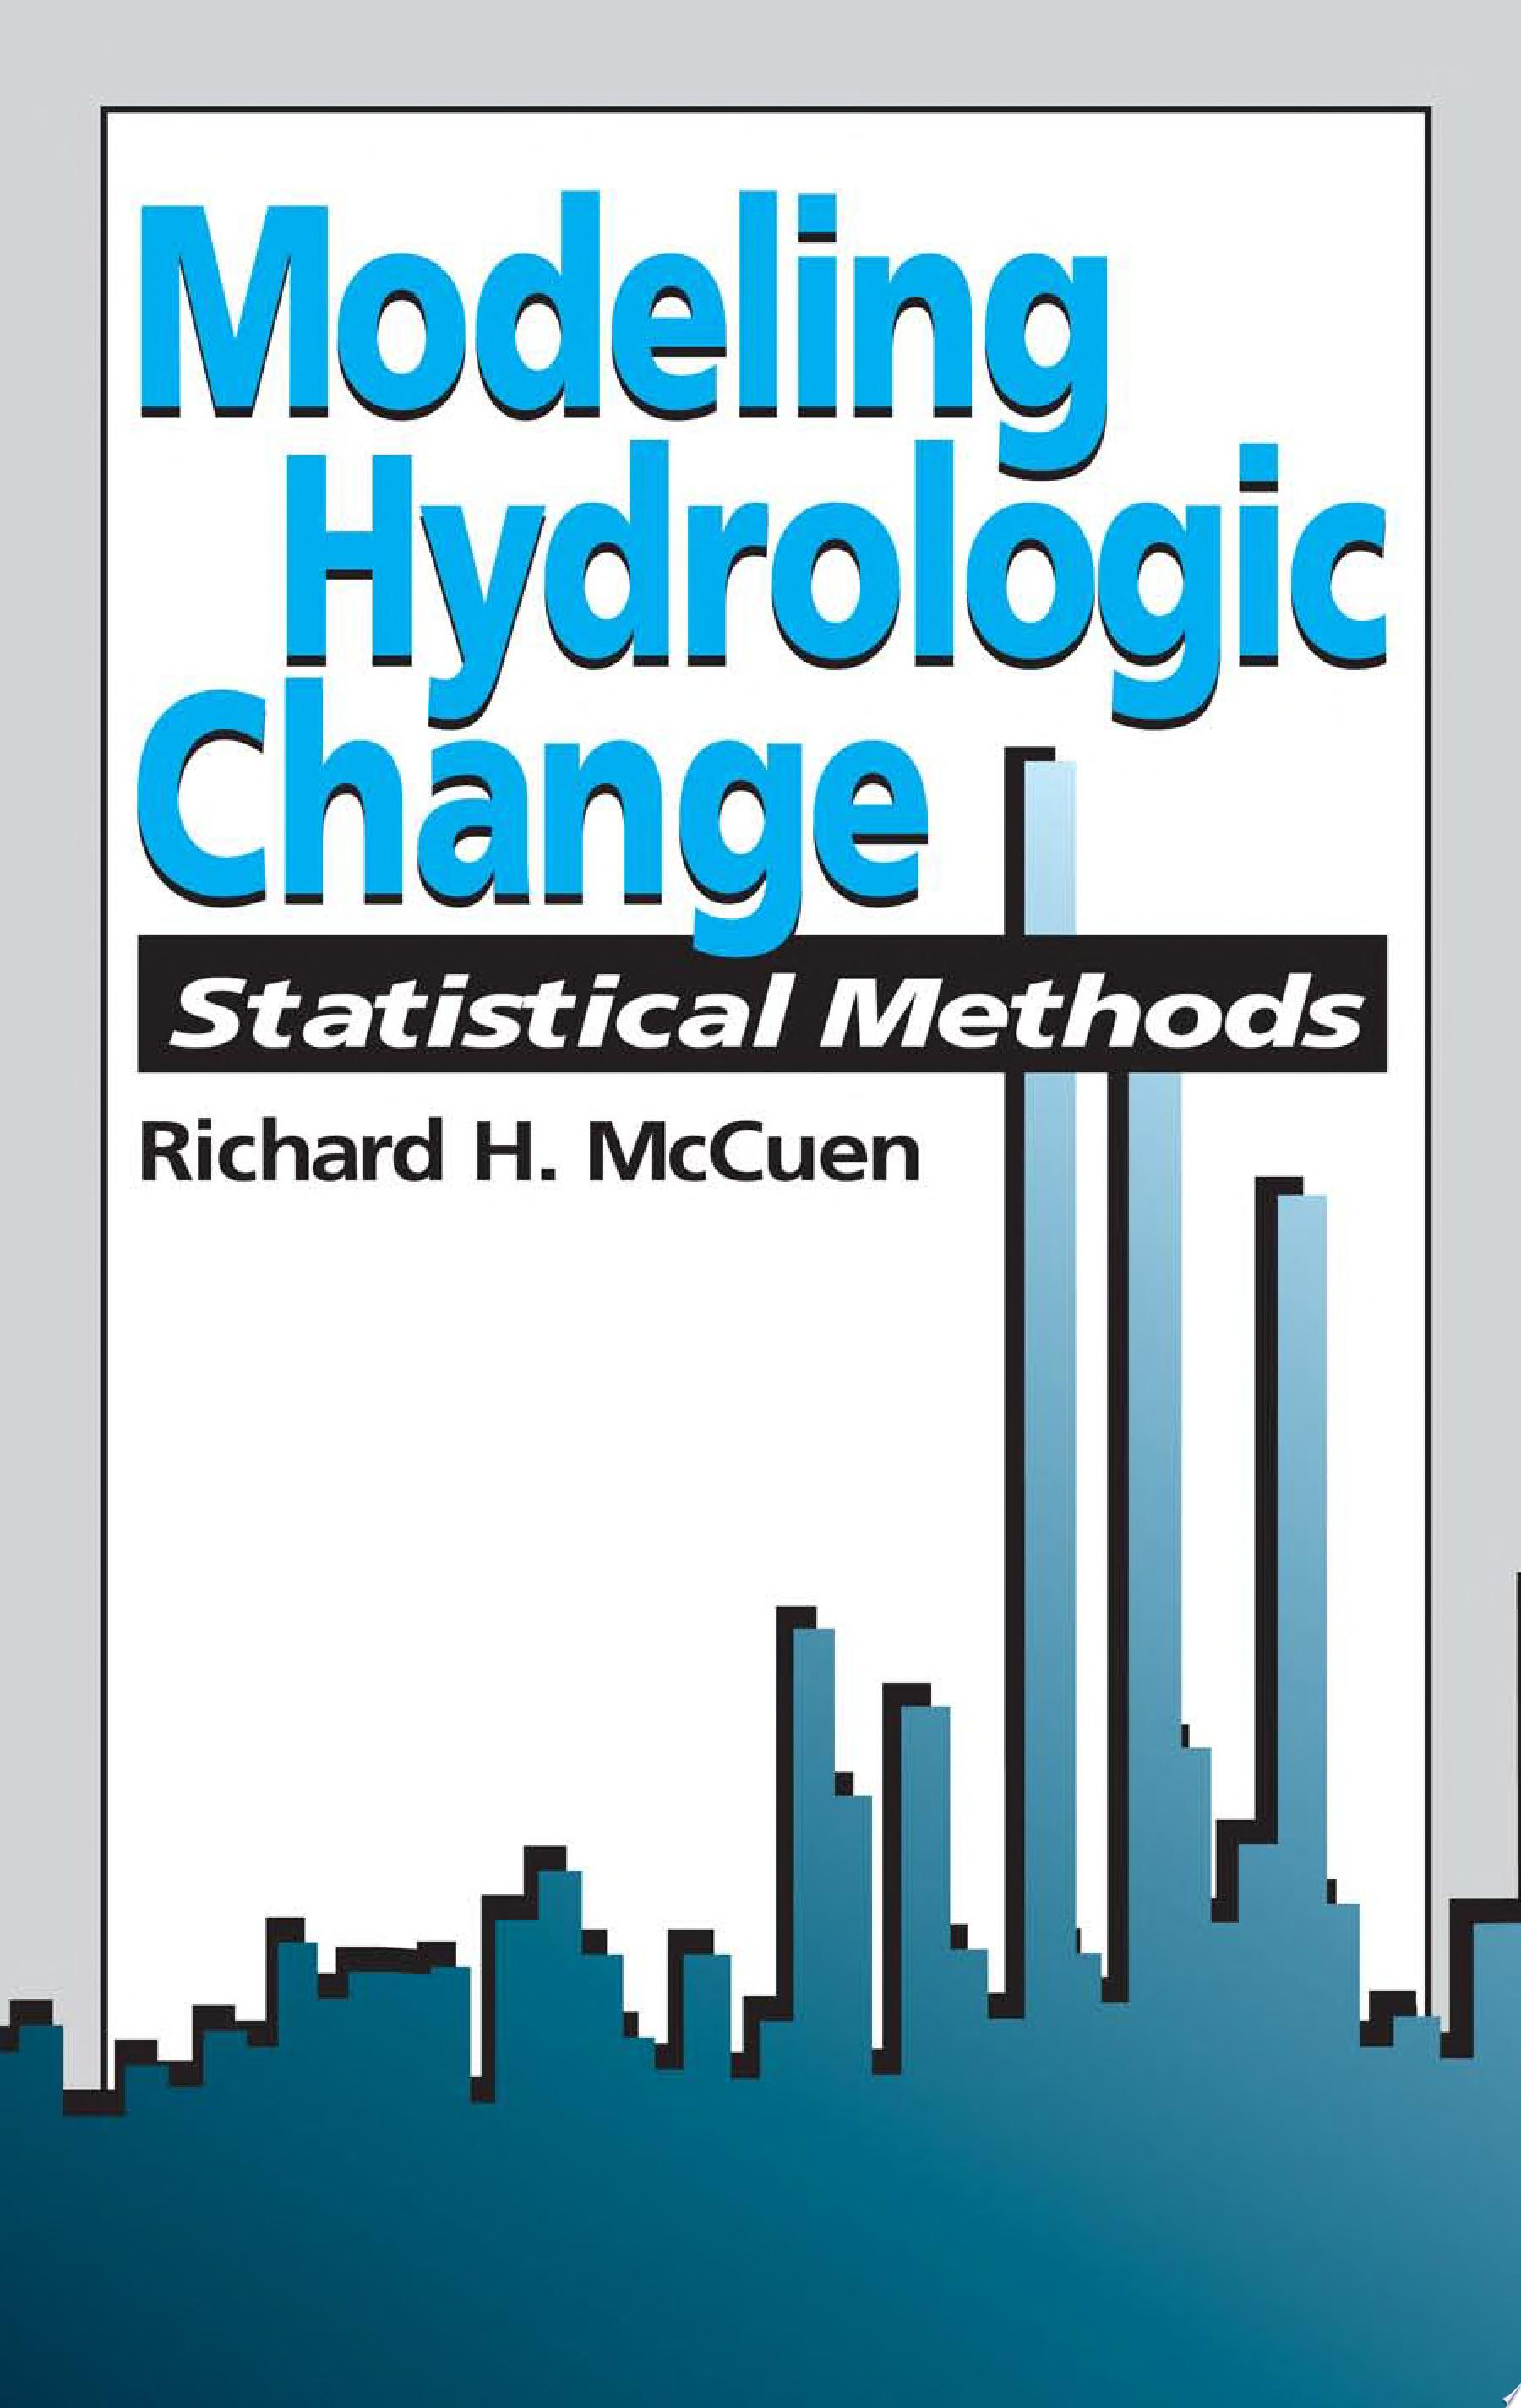 Modeling Hydrologic Change